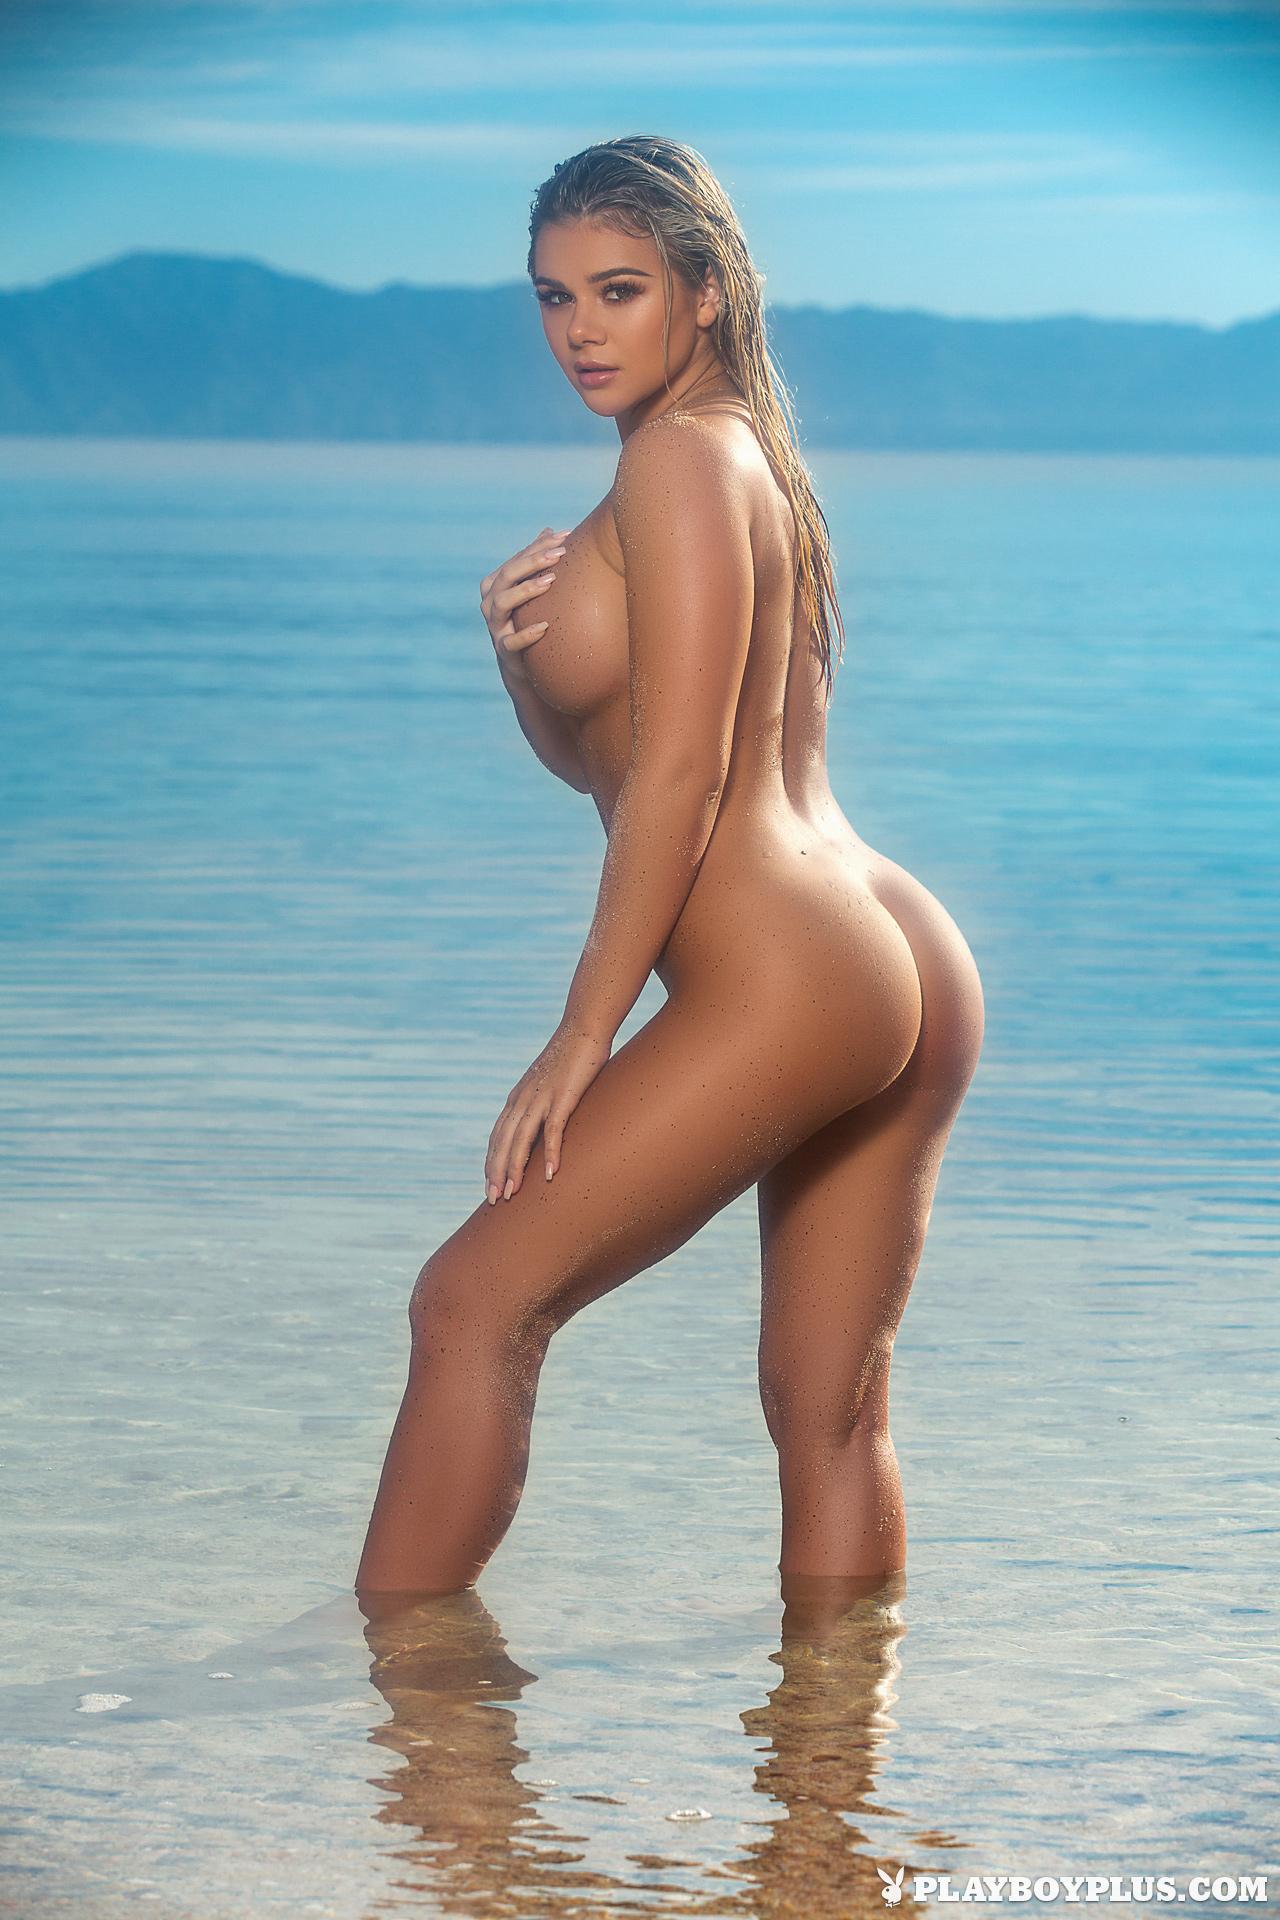 tahlia-paris-beach-bikini-seaside-boobs-blonde-playboy-26